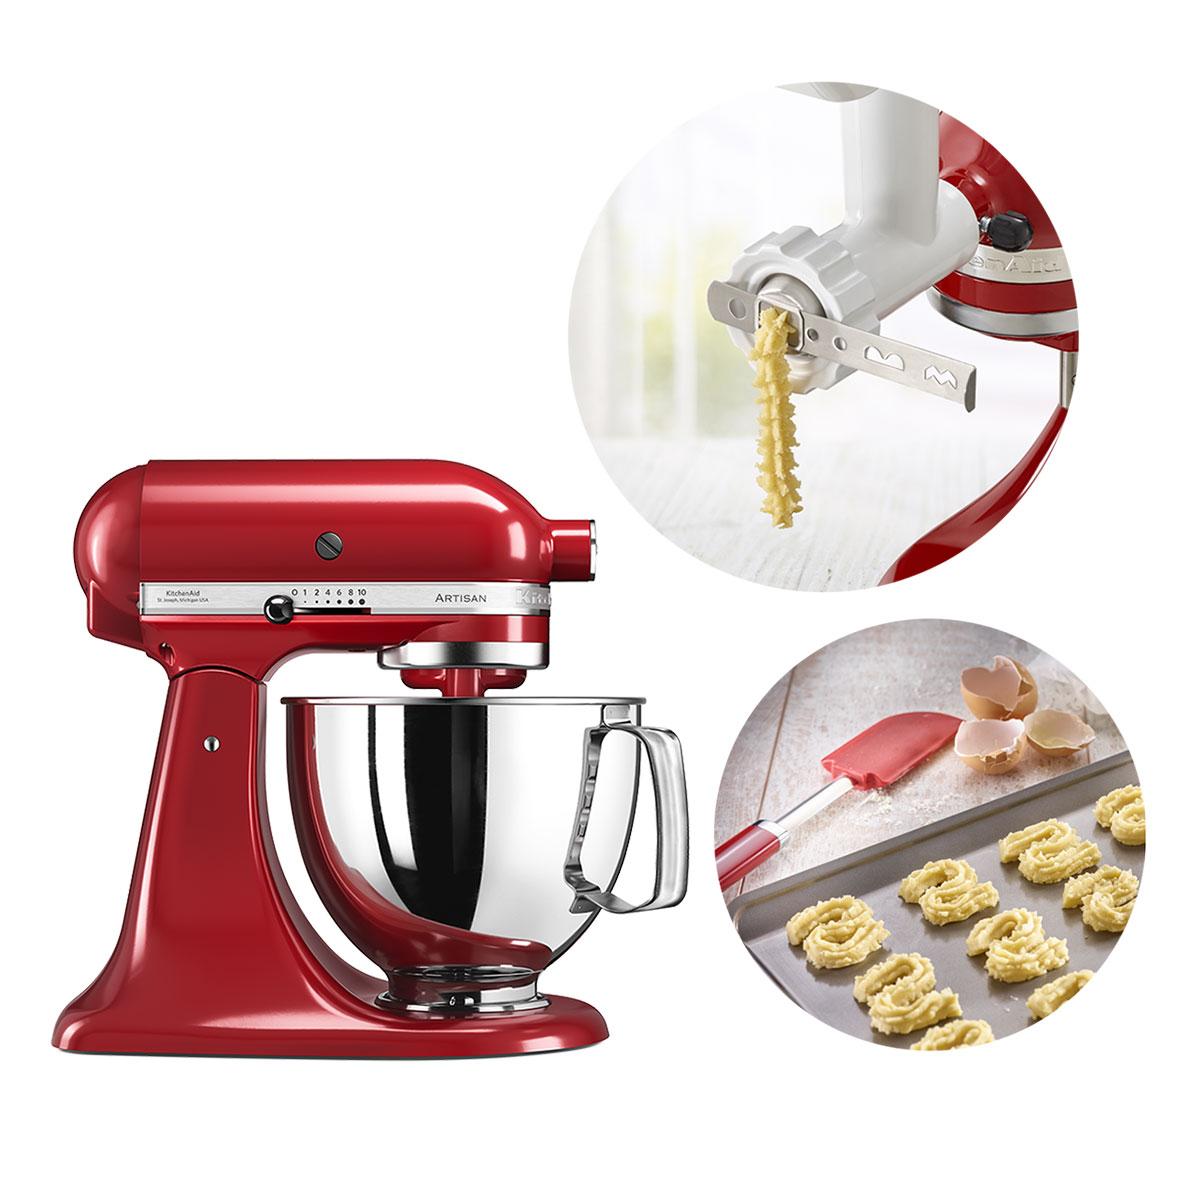 KitchenAid køkkenmaskine med bageudstyr - Artisan - Rød